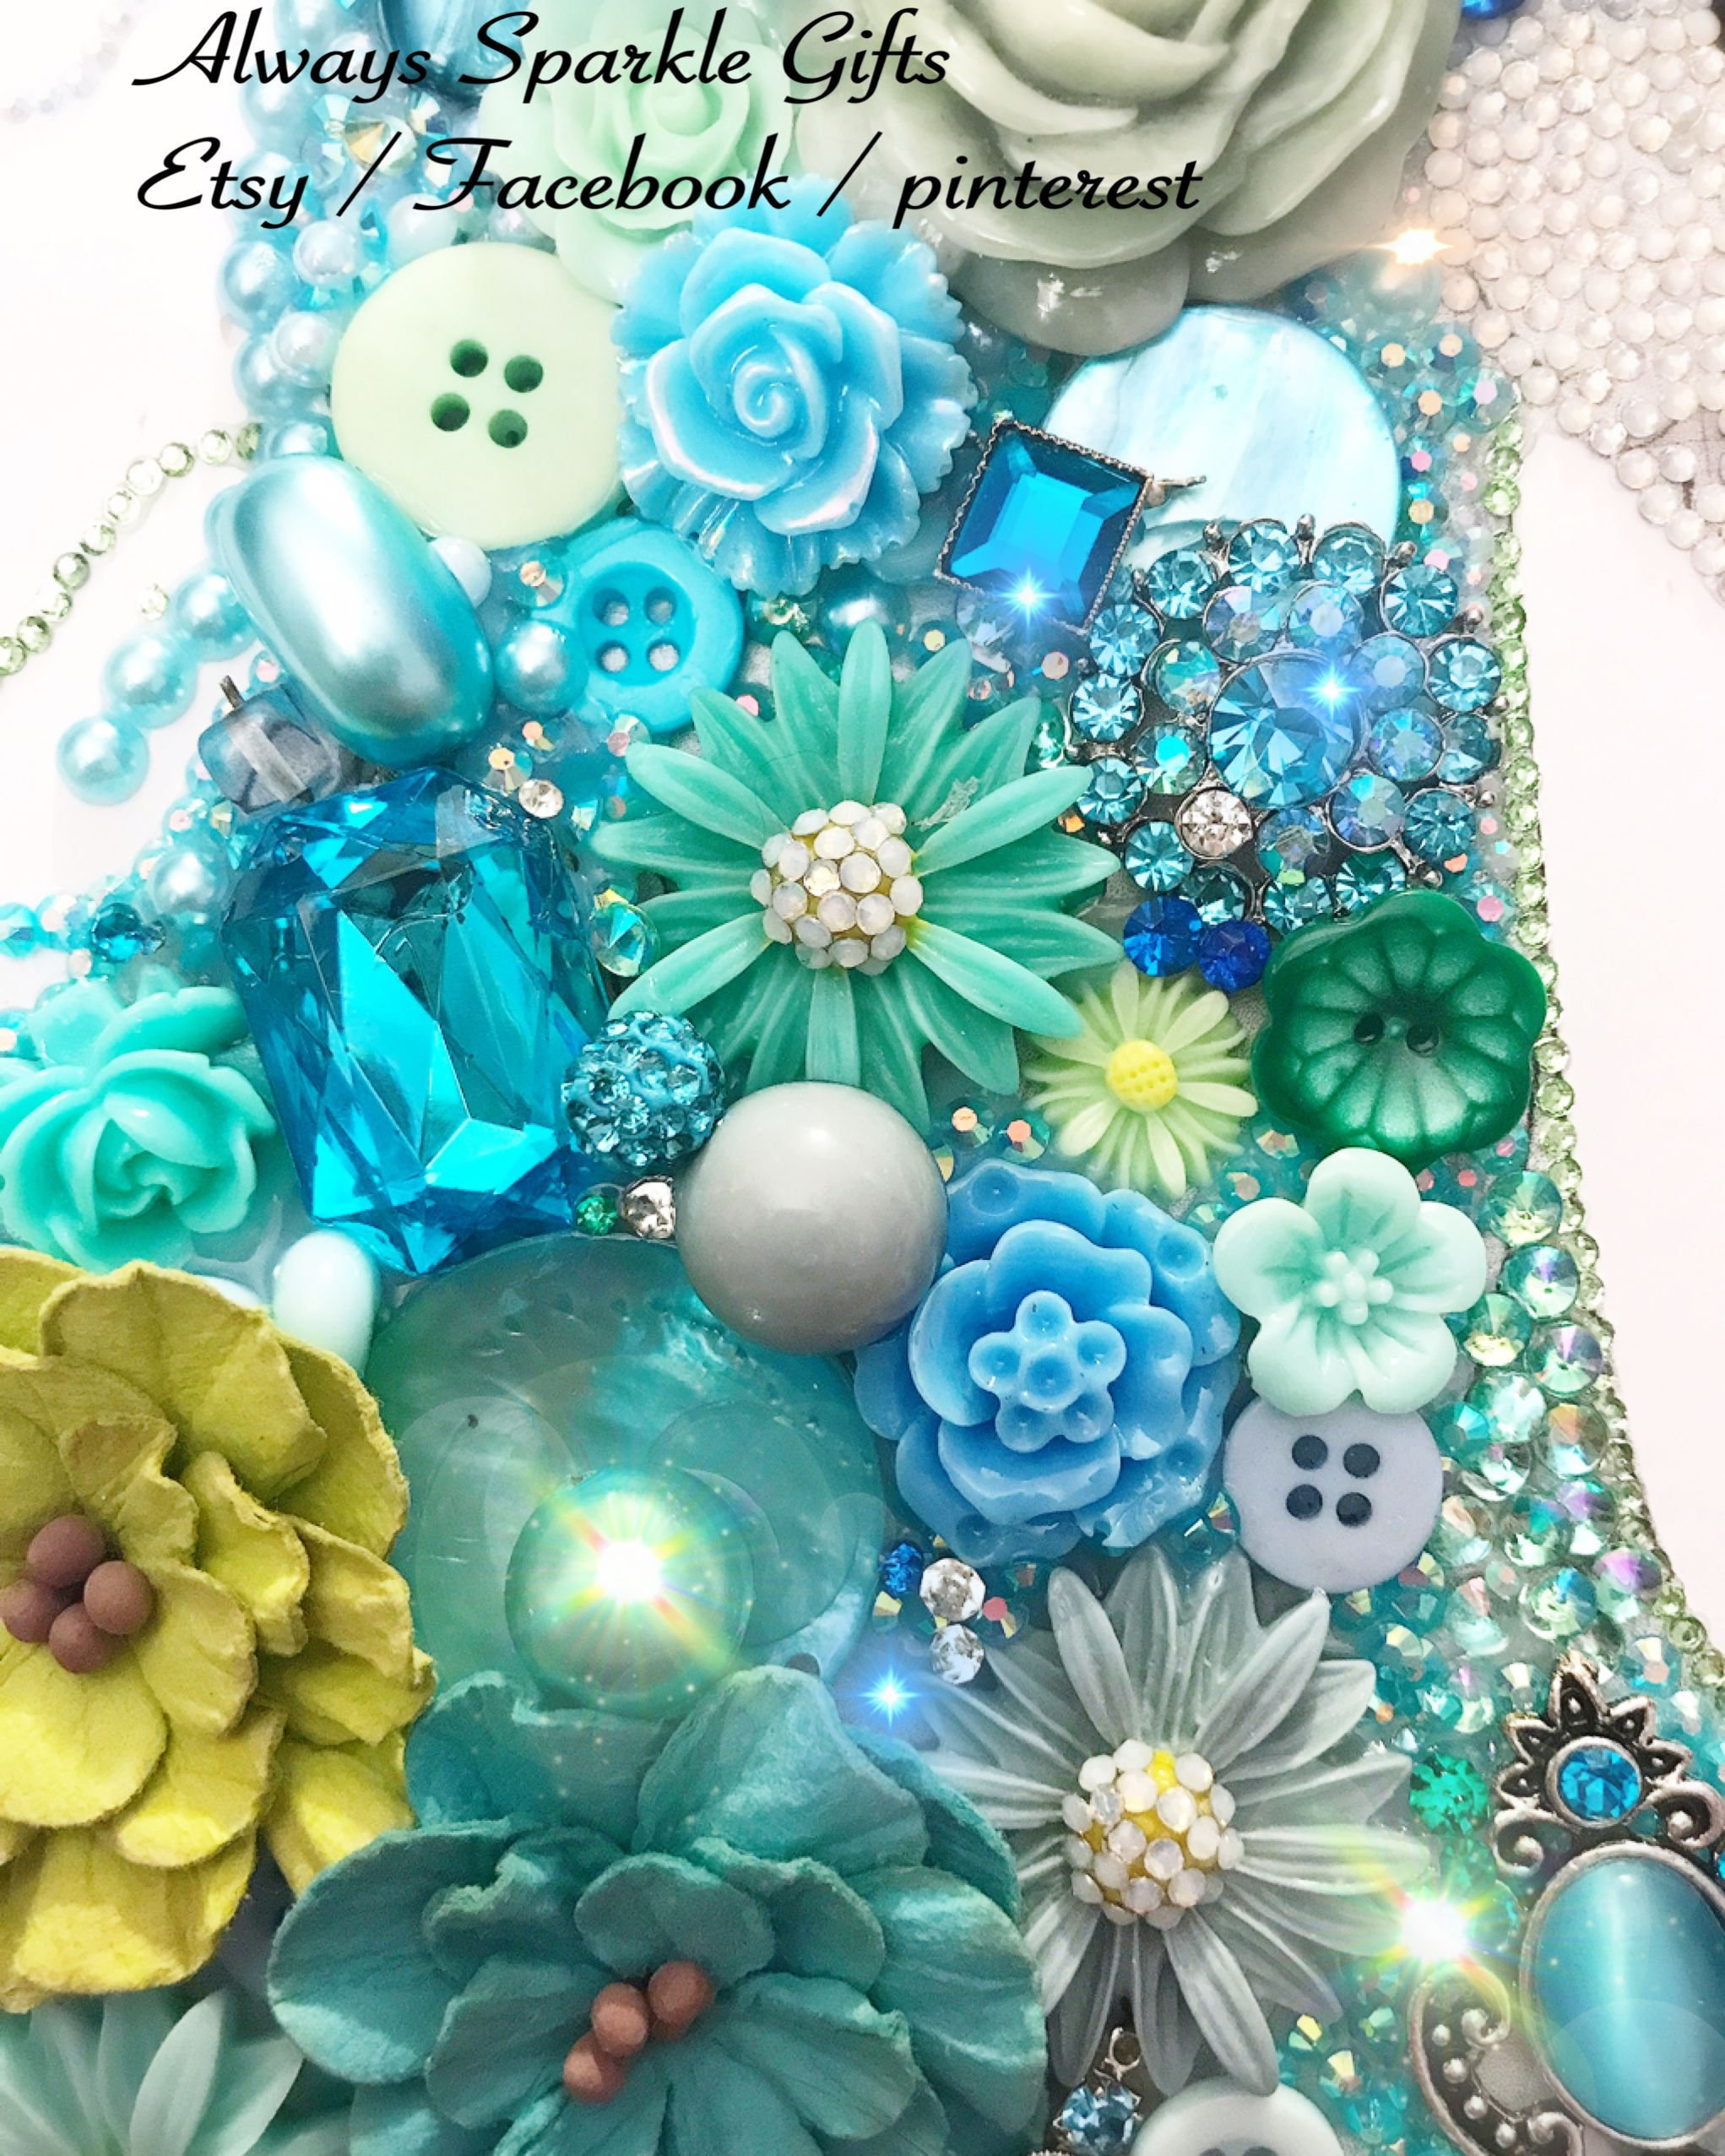 Button Art Unicorns & Mixed Media Art By Alwayssparklegifts